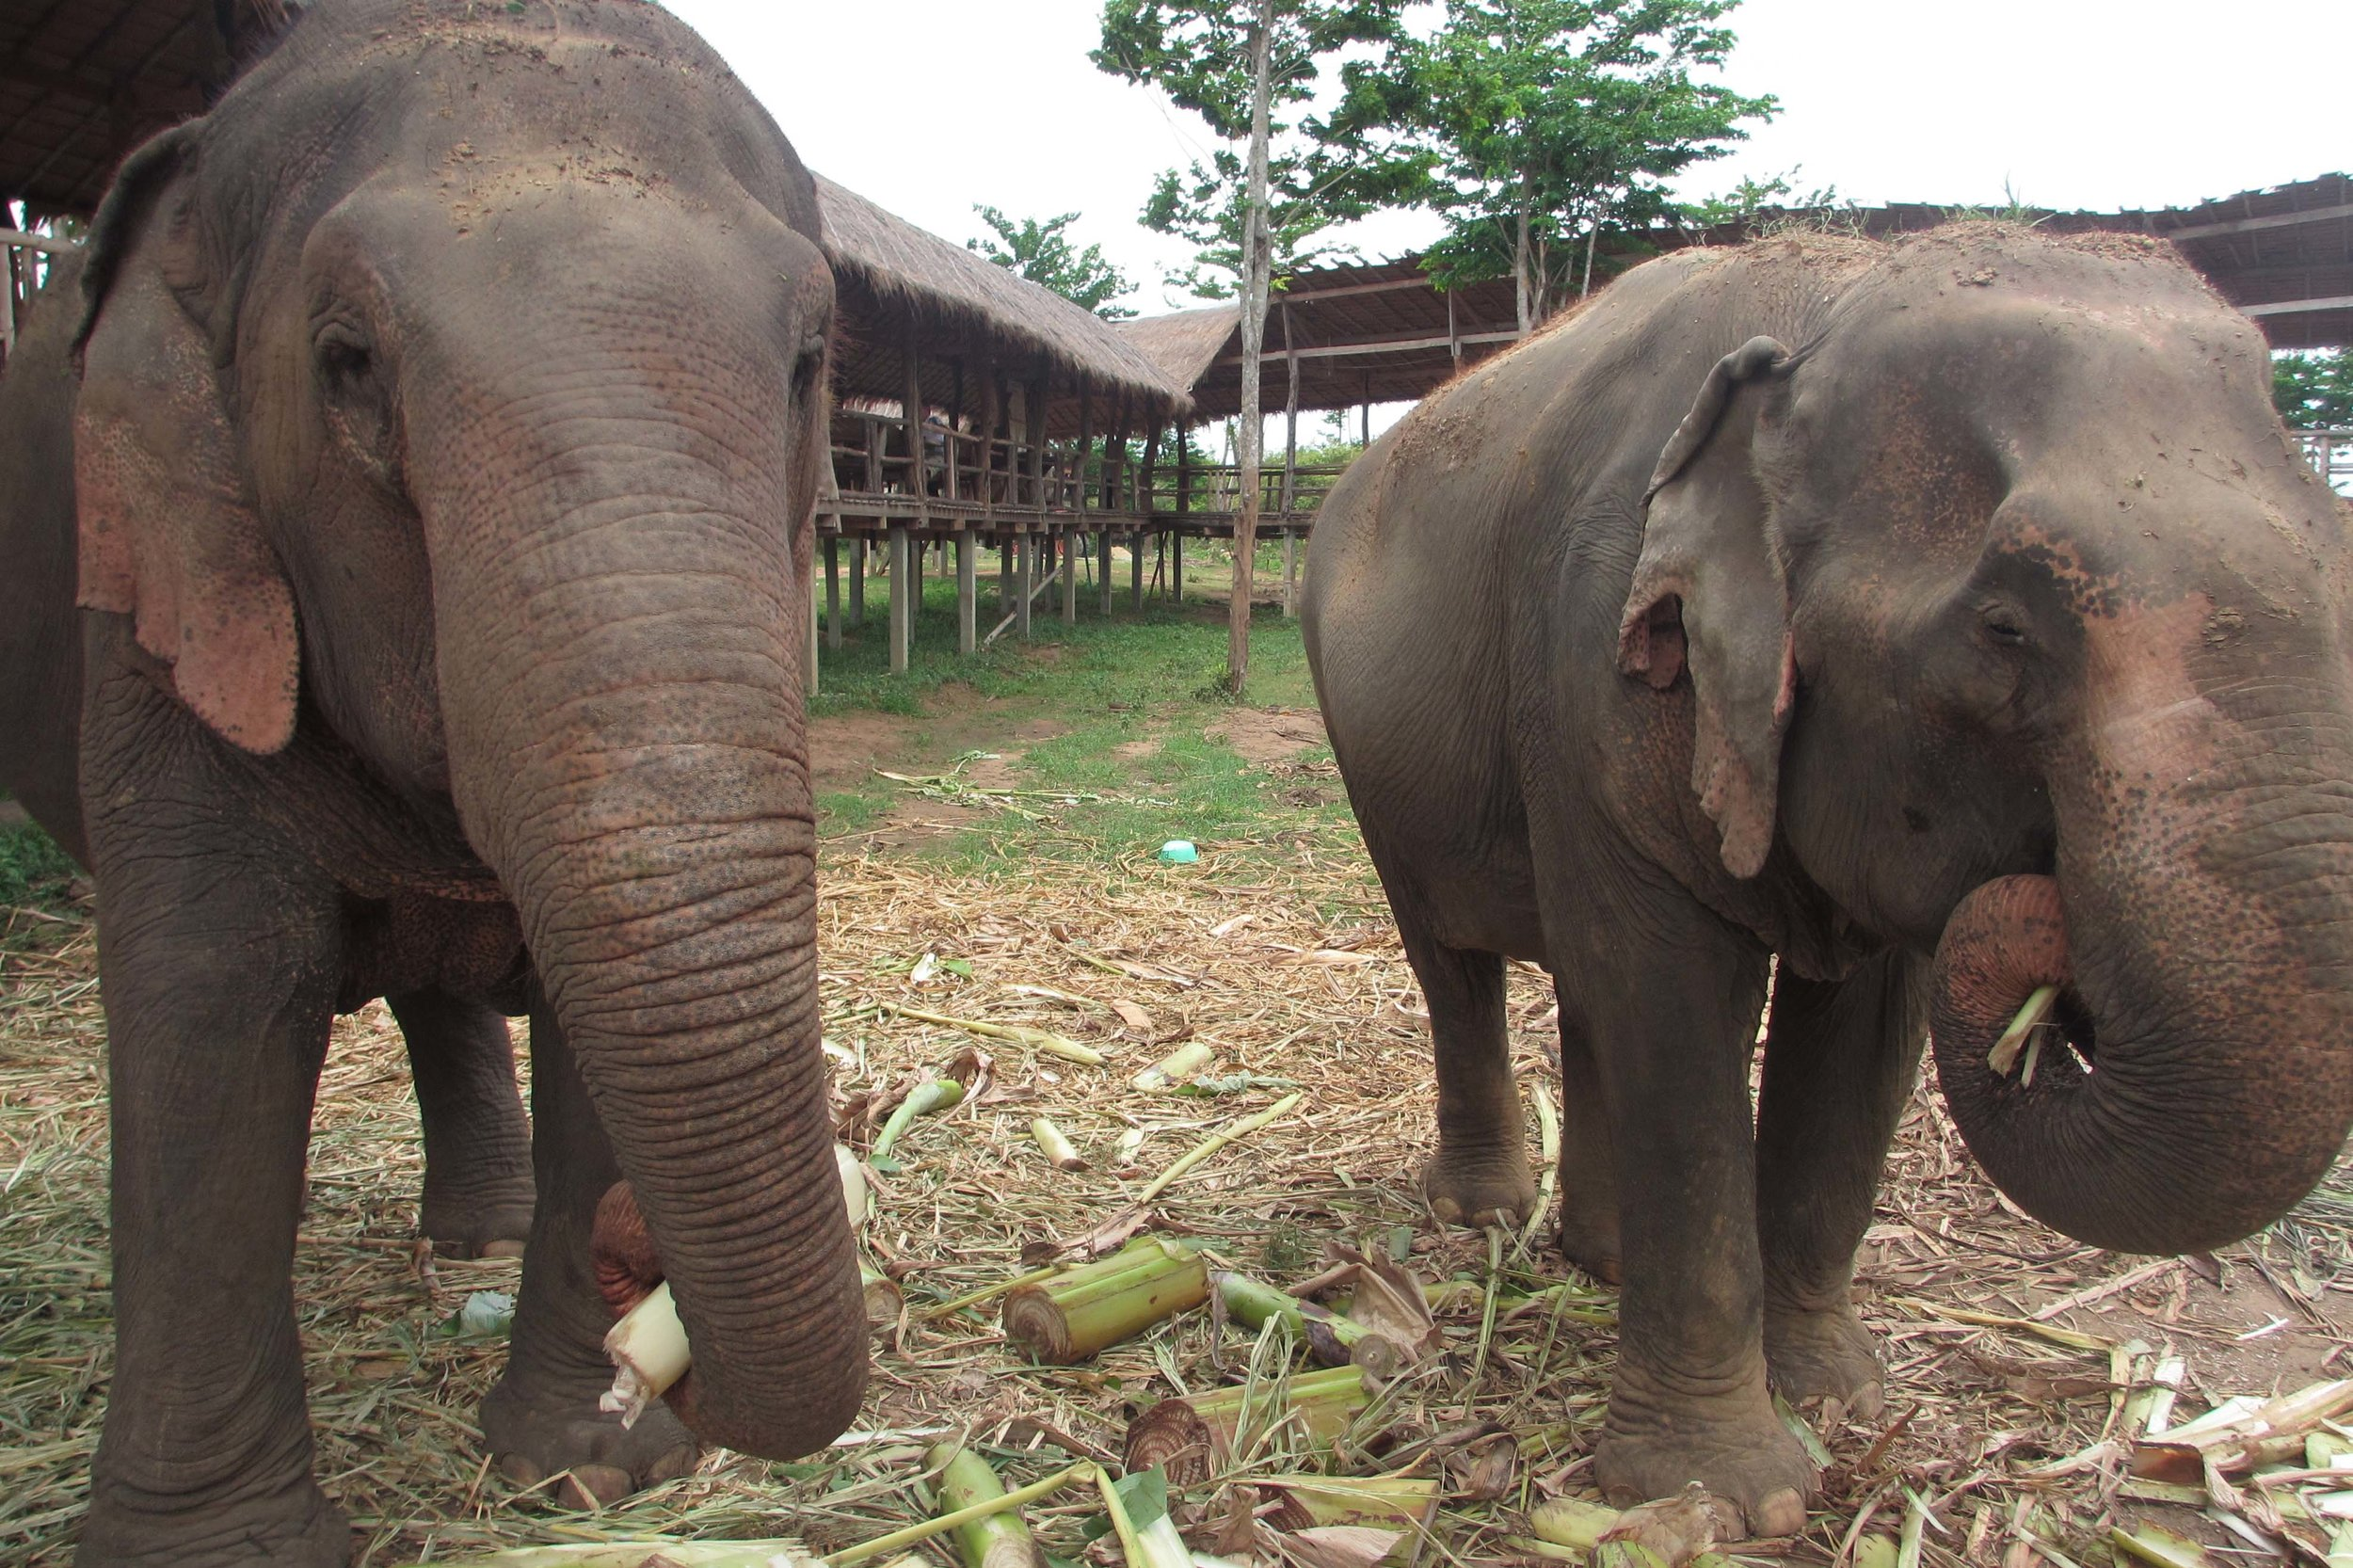 Retired working elephants at ElephantsWorld in Thailand enjoy a snack on sugar cane. Image by Sarah Reid